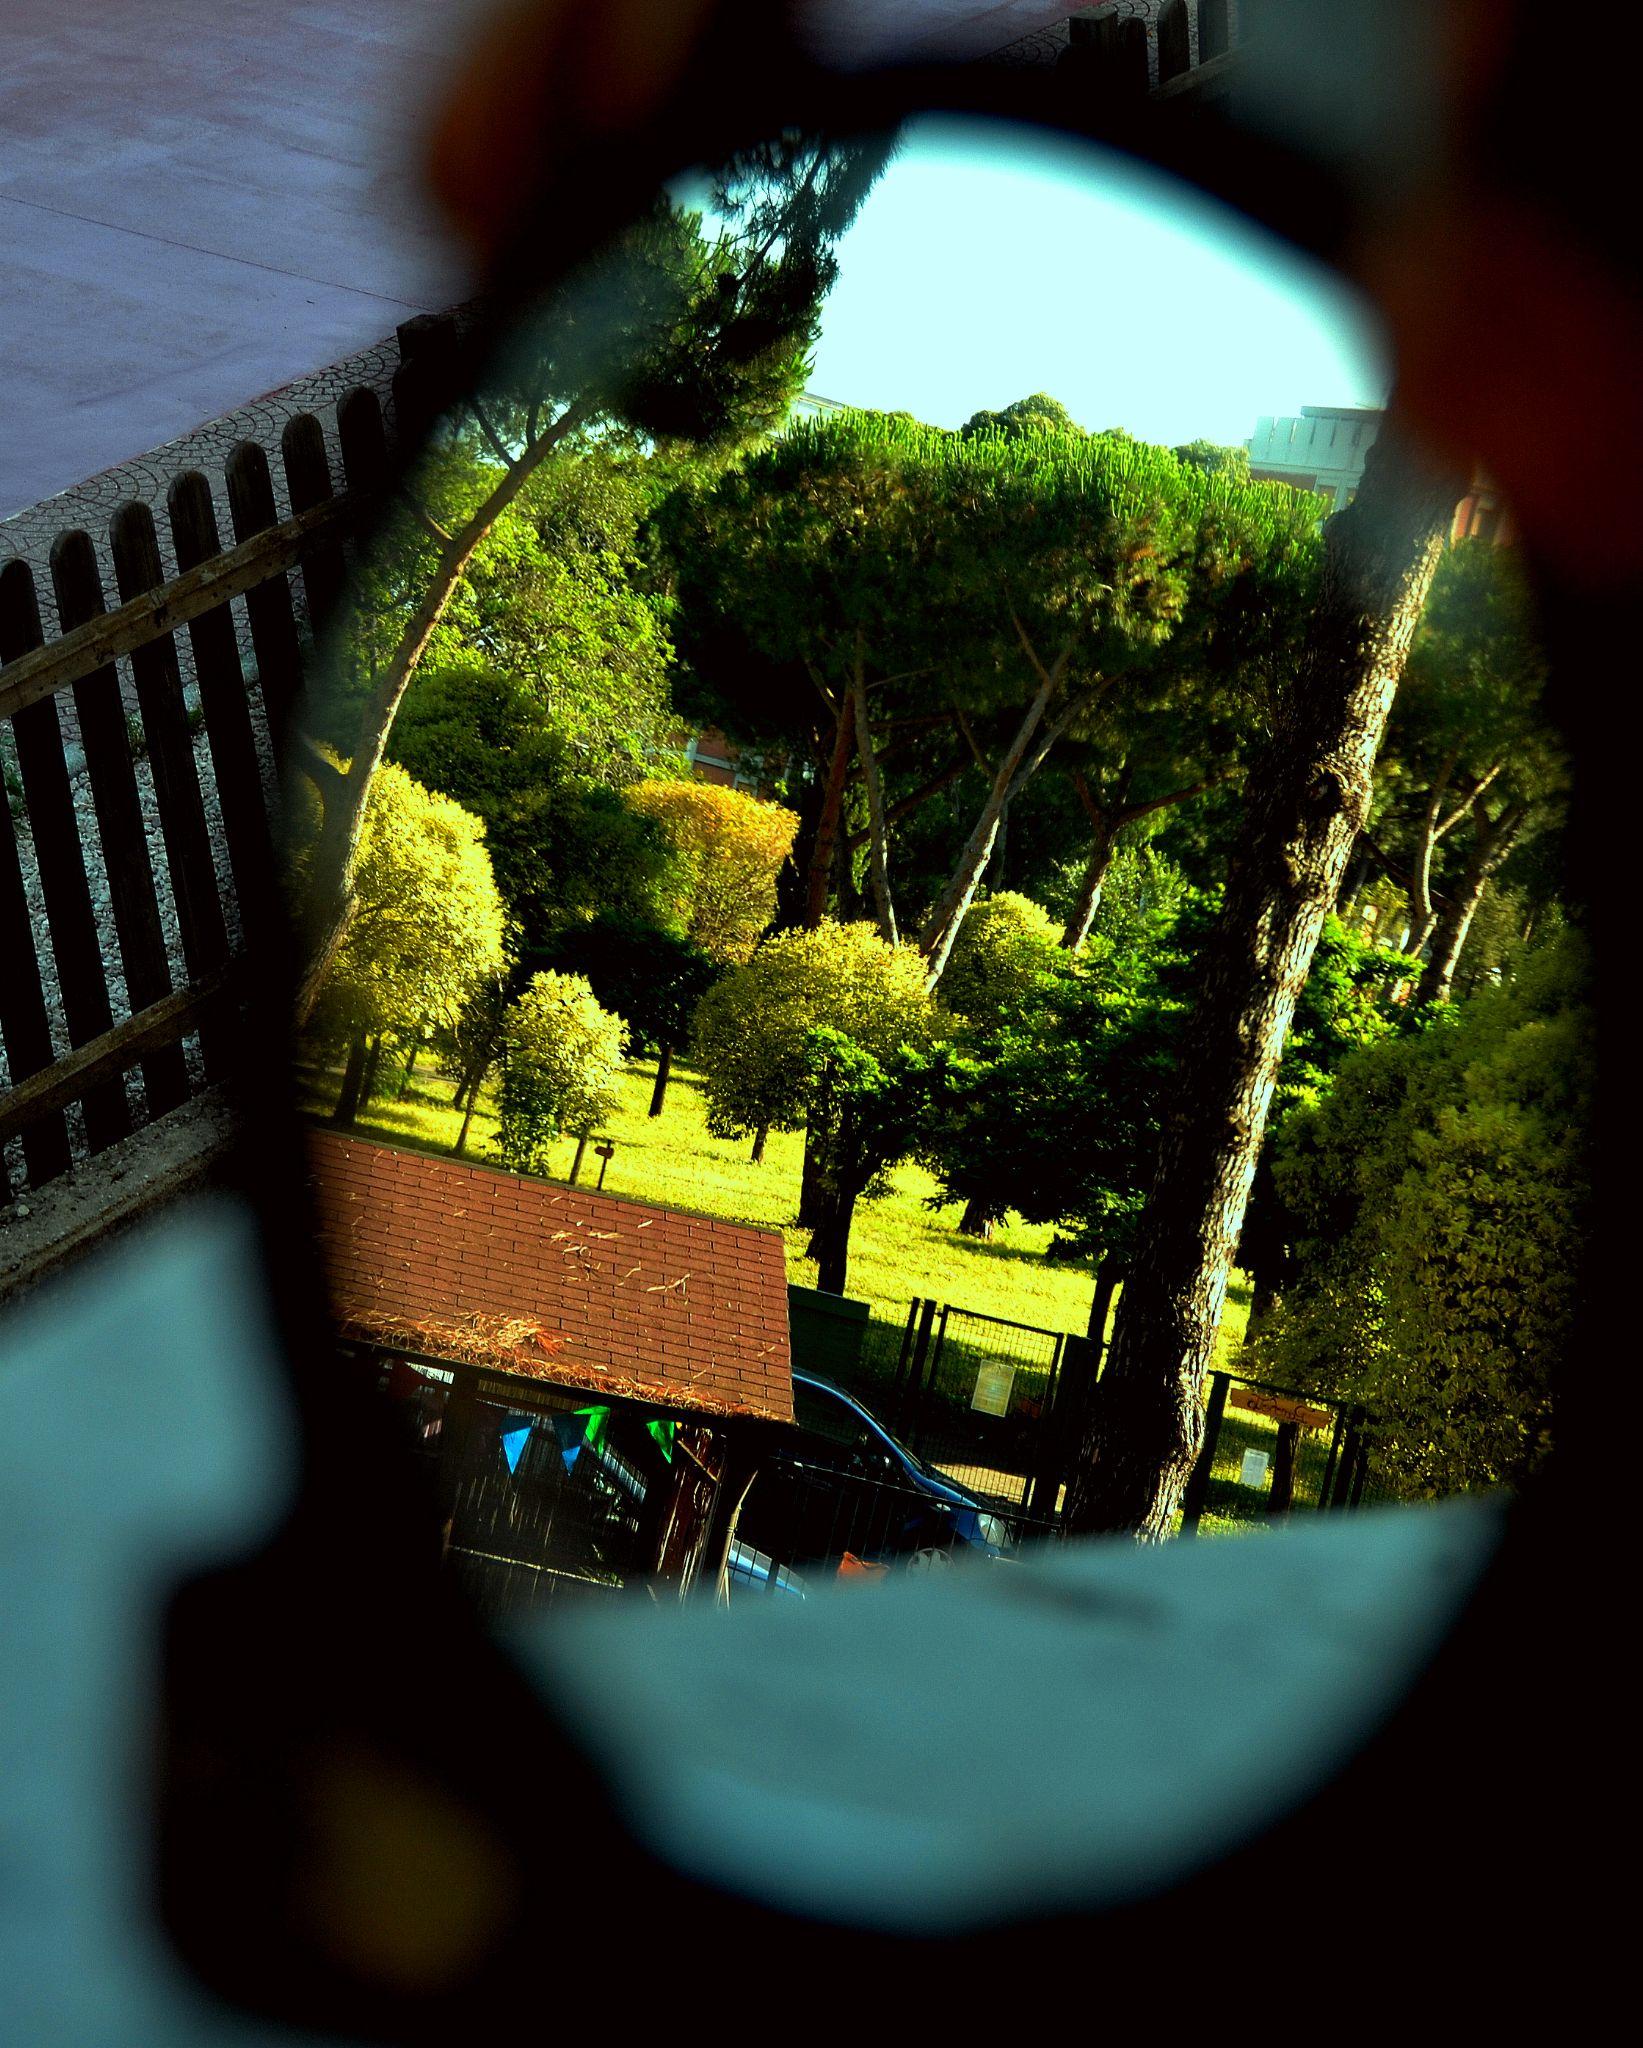 Reflection by PatriziaCortellessa